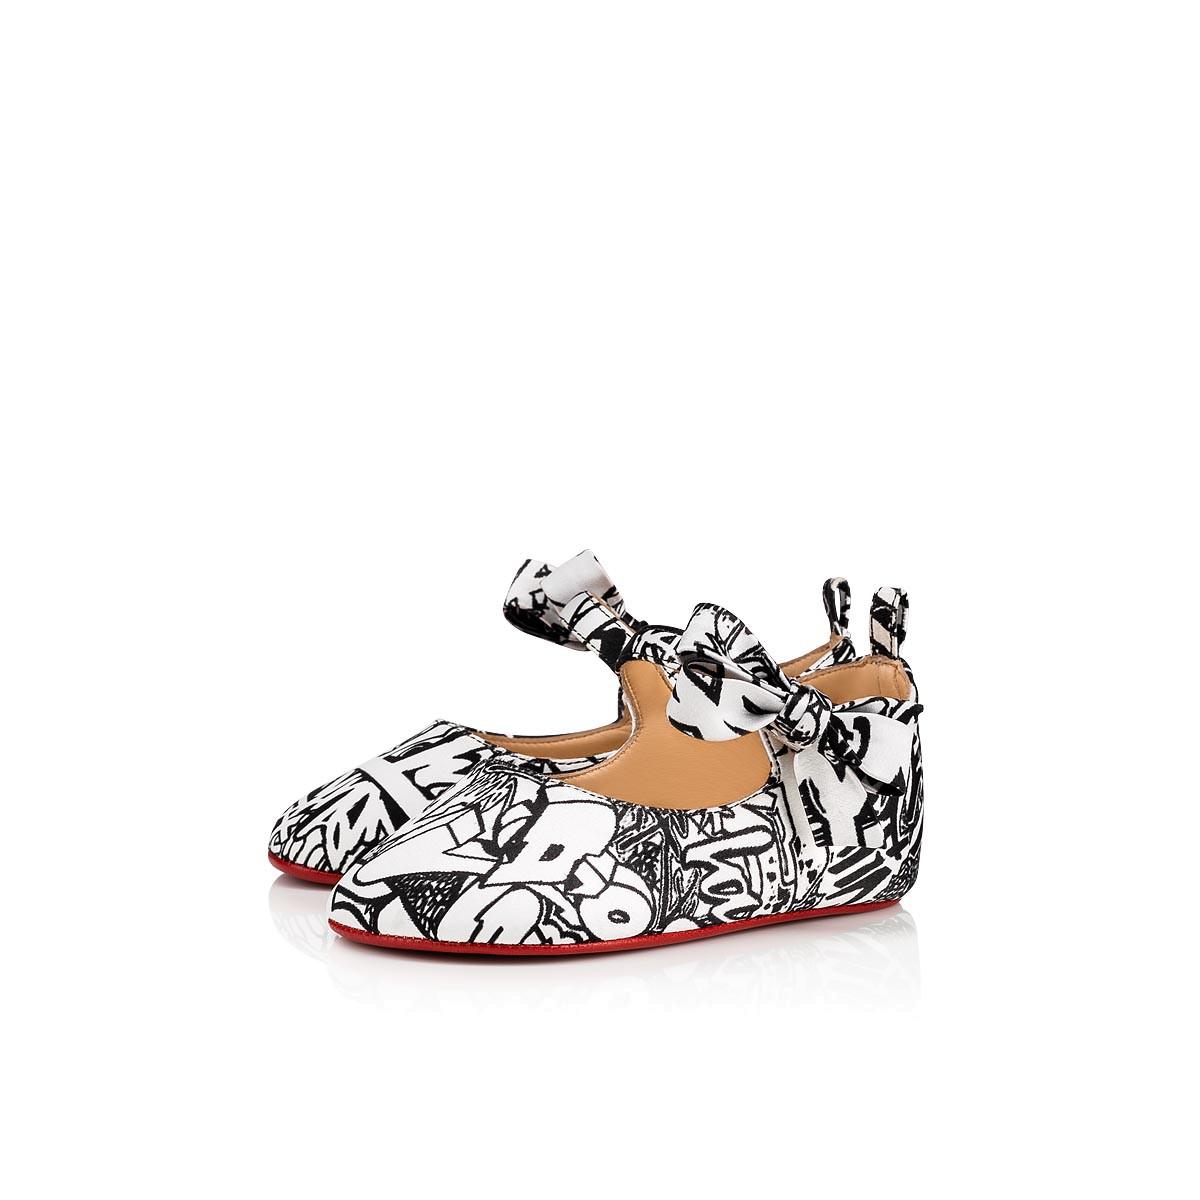 Women Kid Shoes - Baby Shoes Wallgraf Black & White - Christian Louboutin